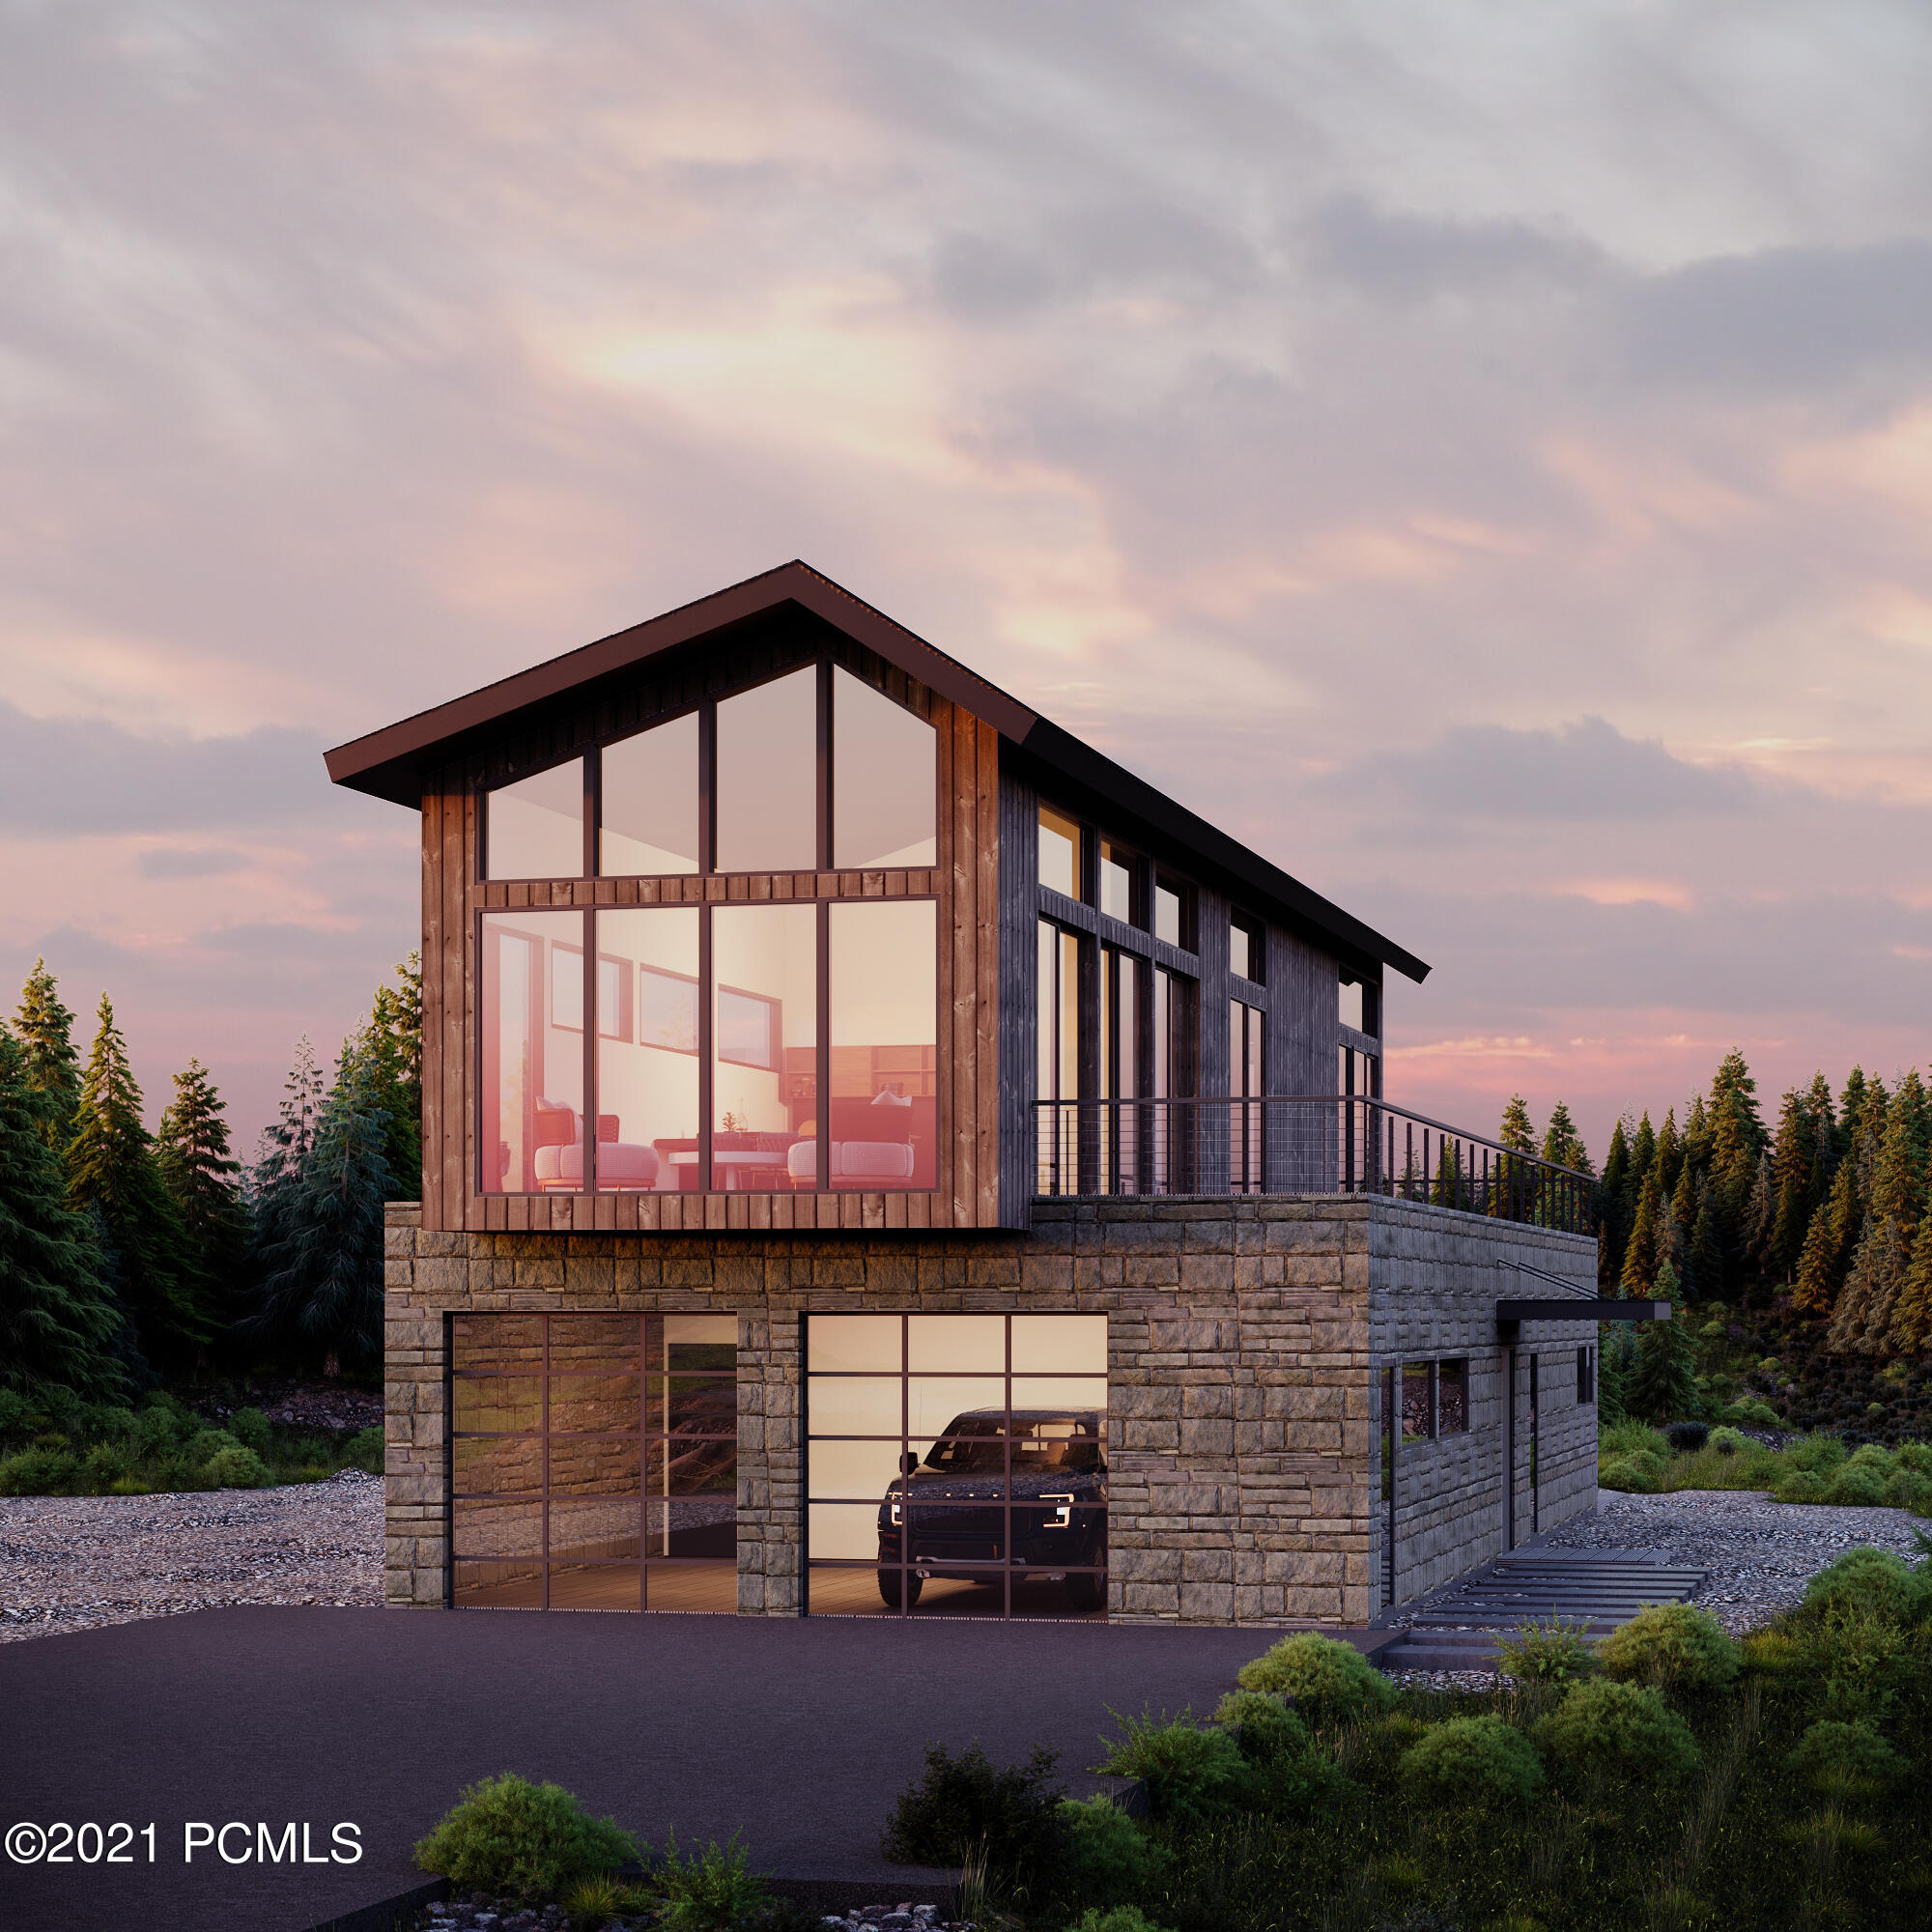 6908 Staffin Drive, Heber City, Utah 84032, 4 Bedrooms Bedrooms, ,4 BathroomsBathrooms,Single Family,For Sale,Staffin,12104204